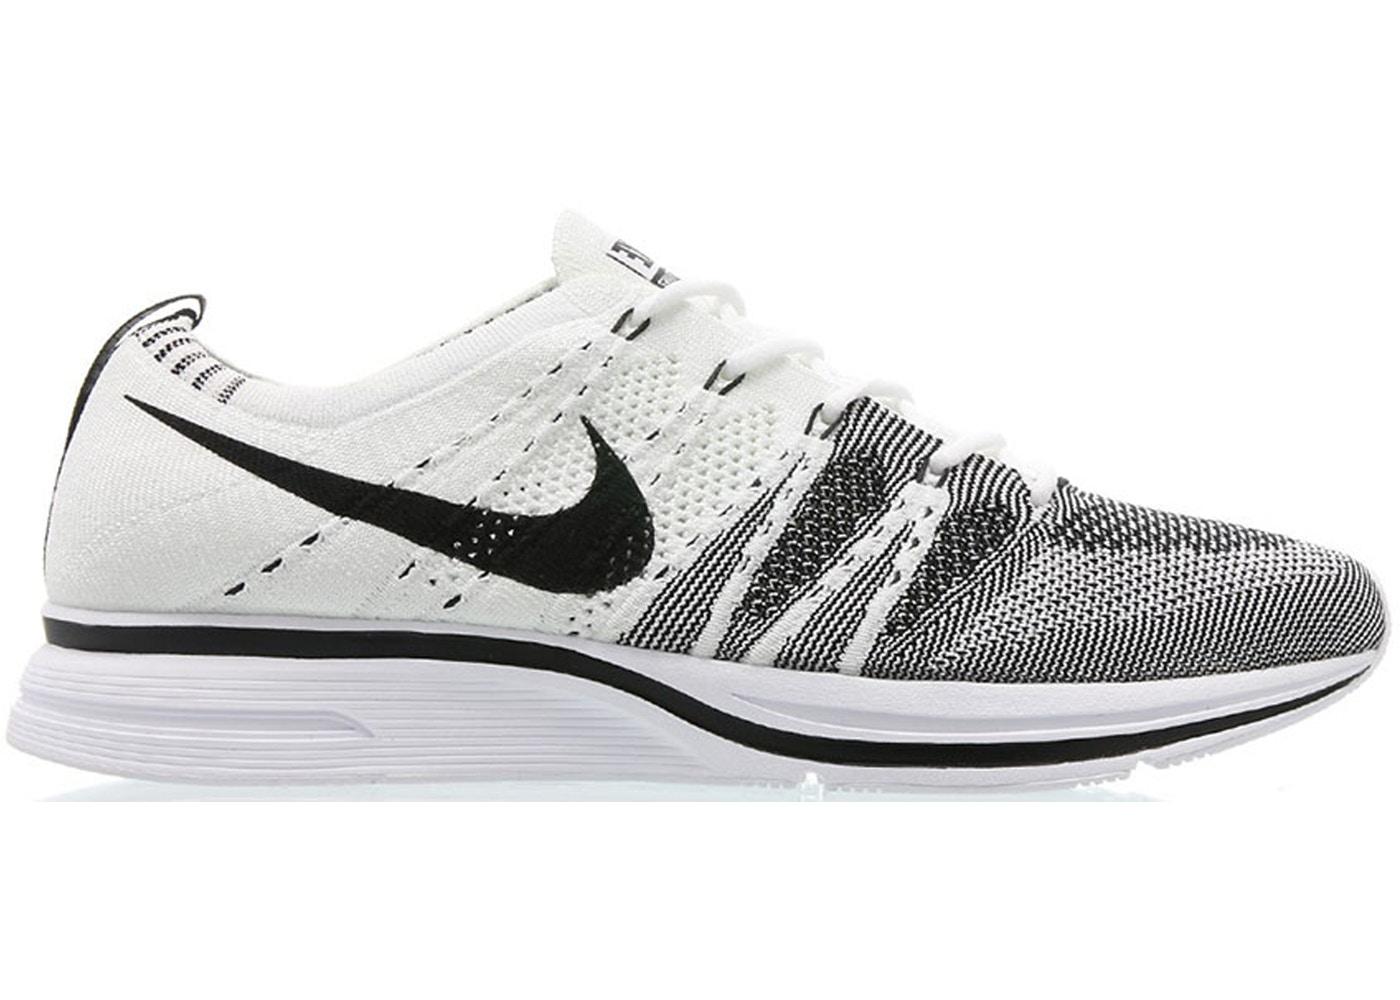 Nike-Flyknit-Trainer-White-Black-2017.png.jpeg